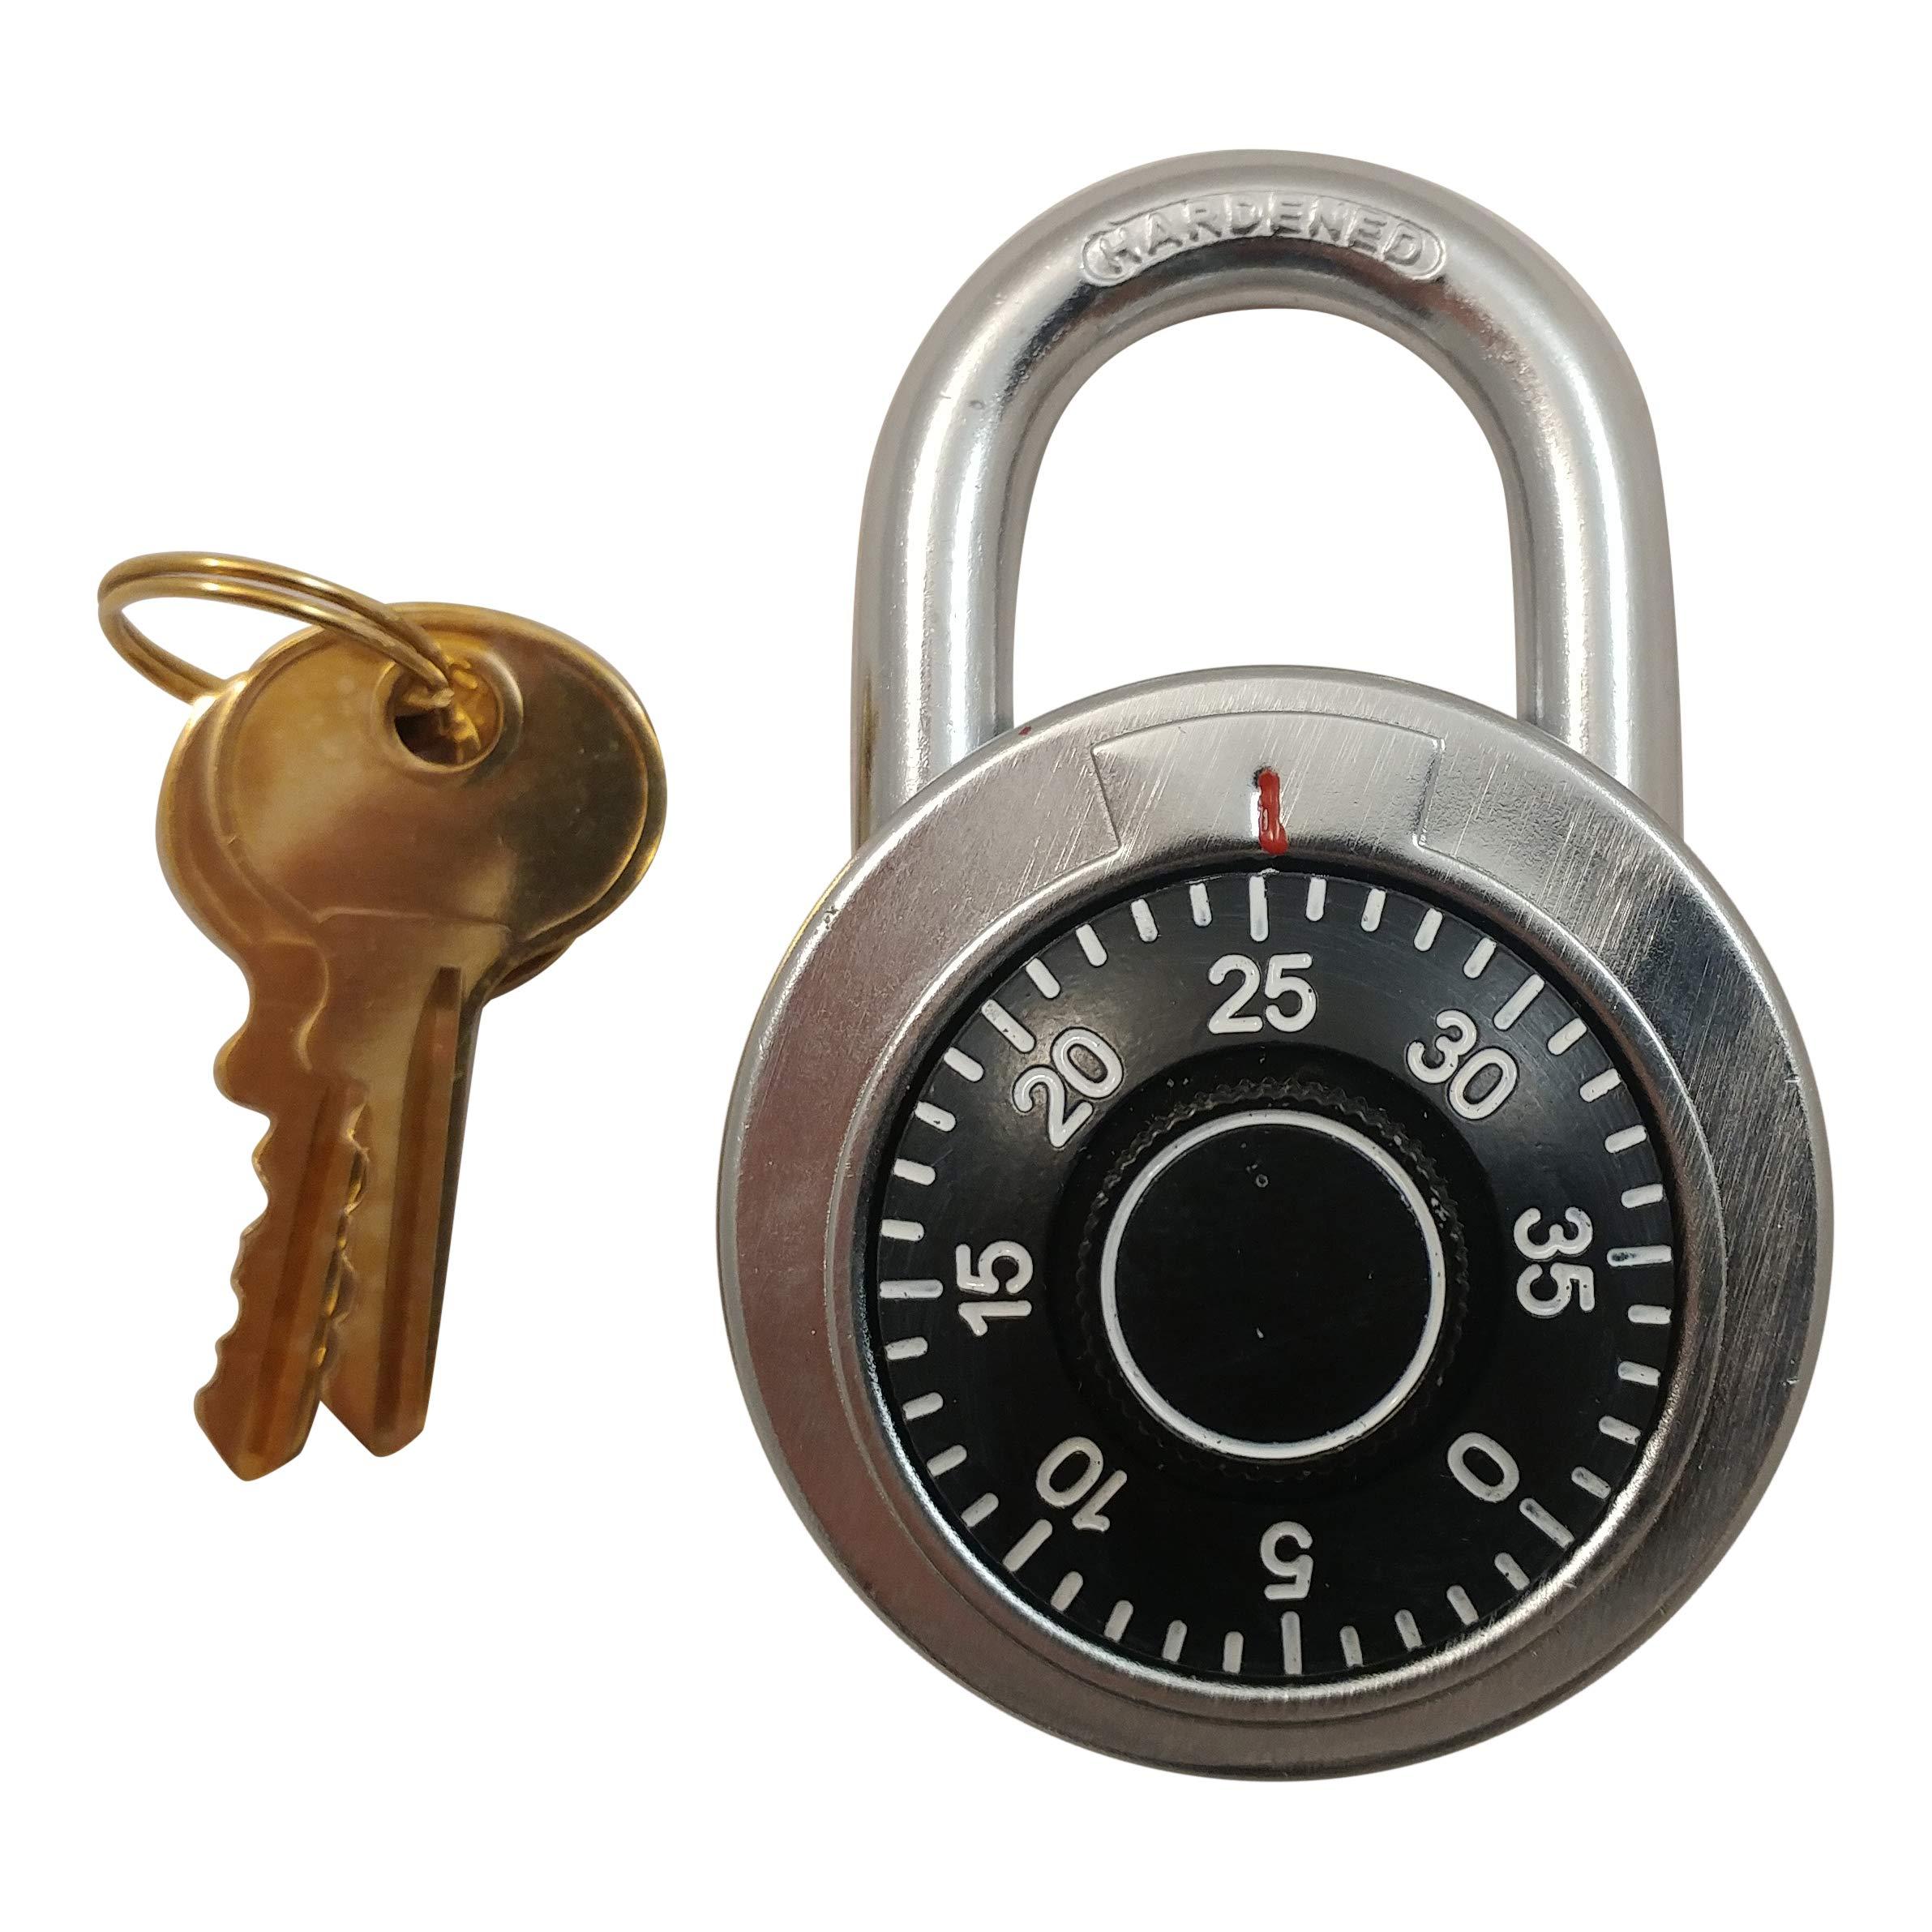 Combination Locks with Single Override Control Key Padlocks Ideal for Lockers [946-10] - Set of 10 Candados de Combinacion by Madol (Image #4)